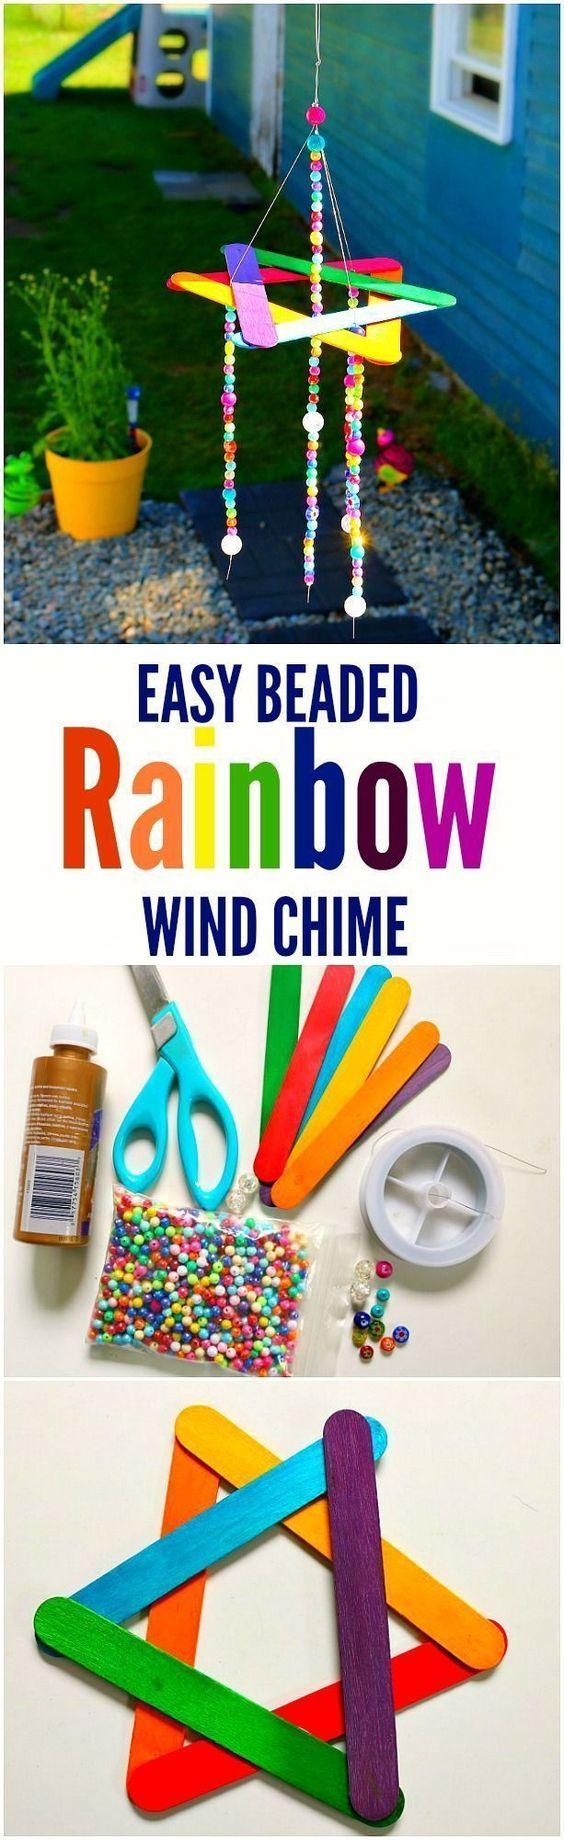 Easy Beaded Rainbow Wind Chime.